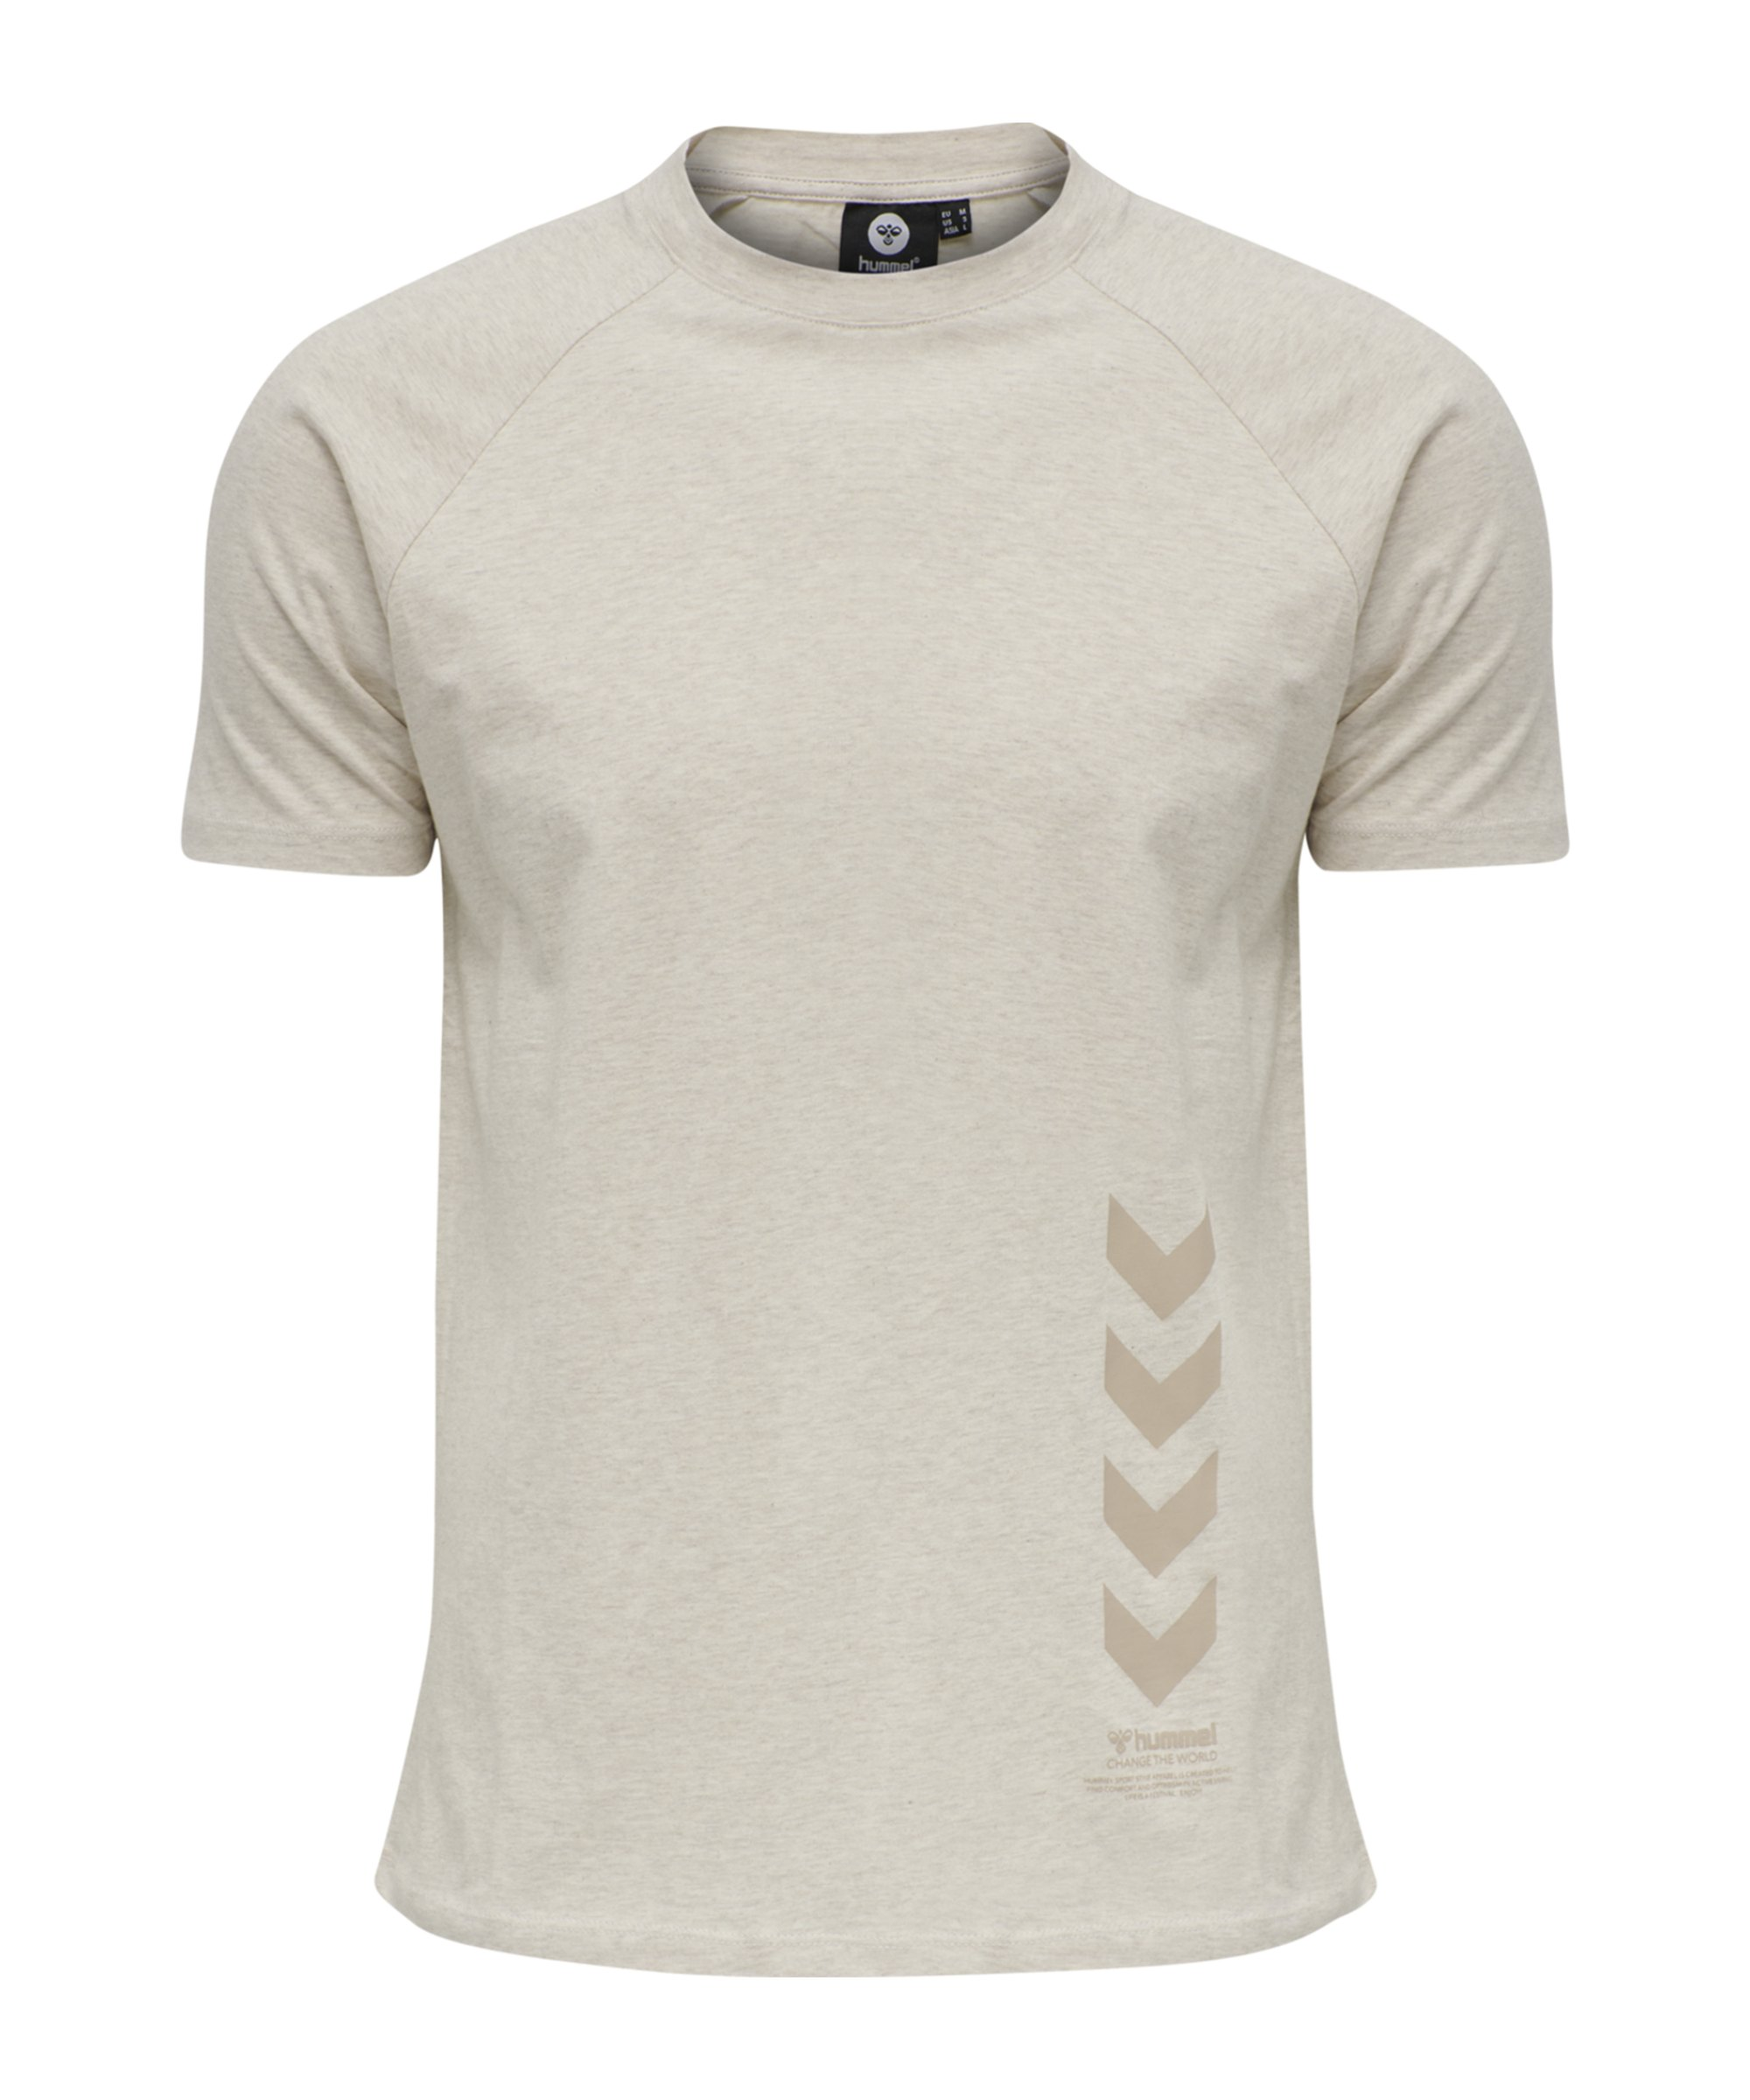 Hummel Caleb T-Shirt Beige F9081 - beige